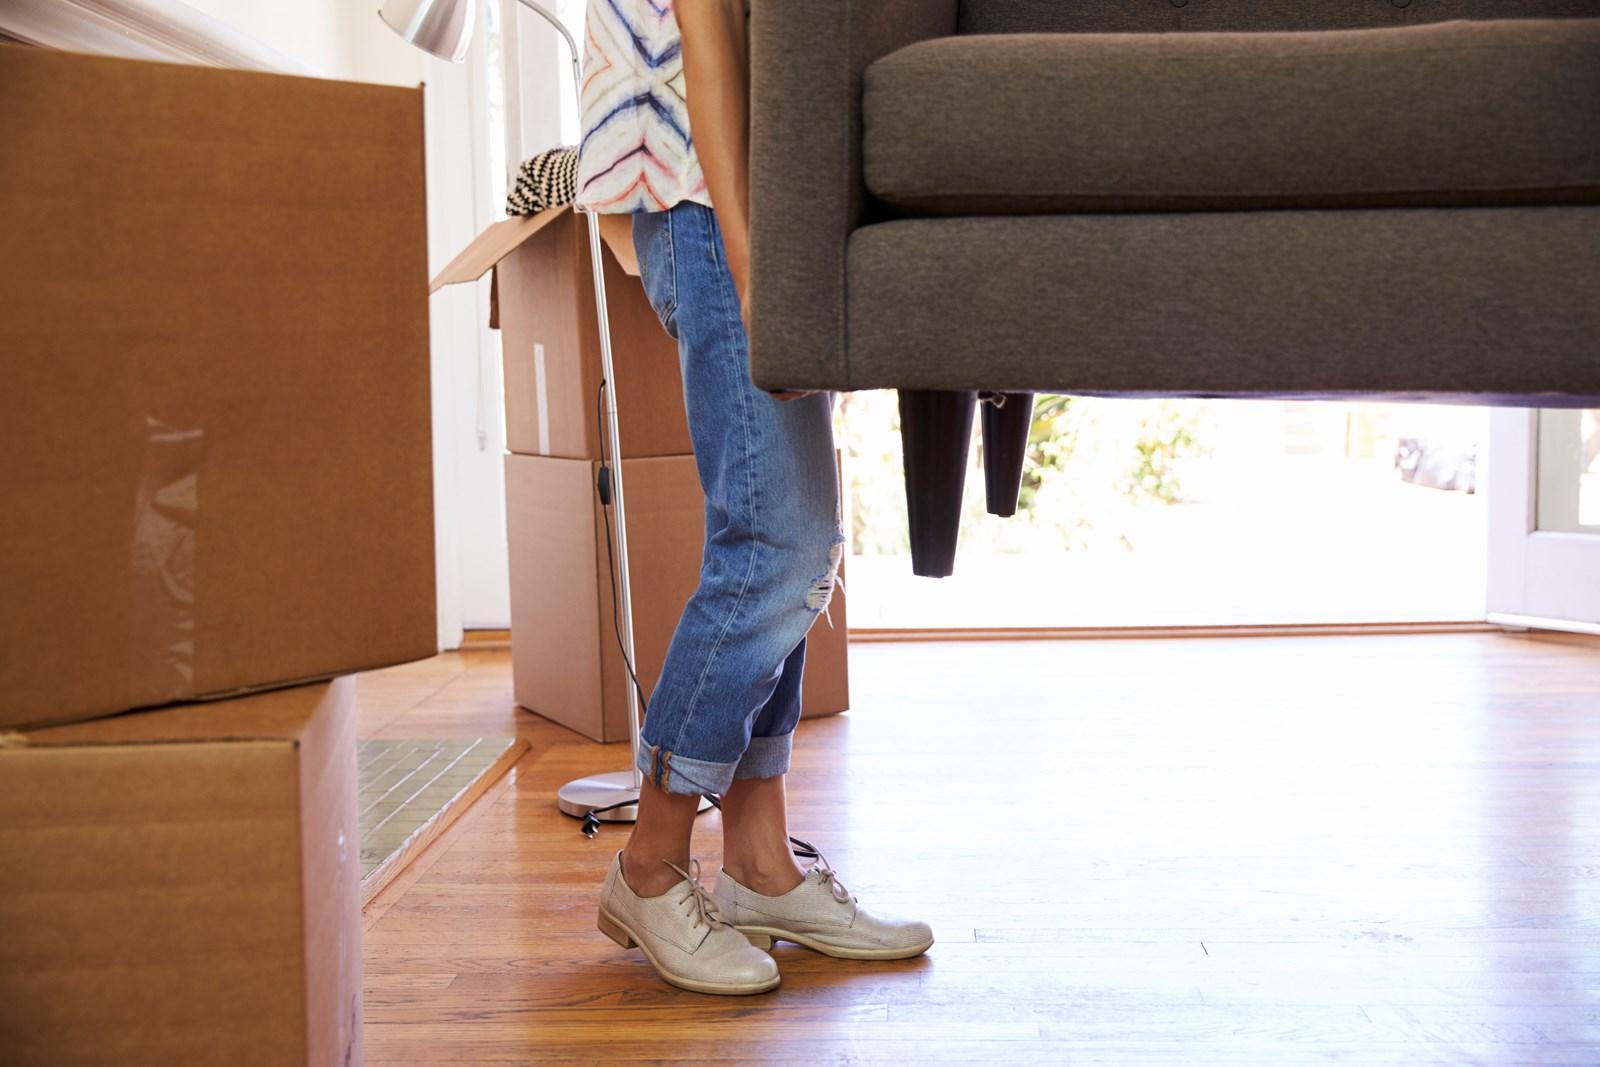 umzugstag bekommt man sonderurlaub der standard immobilien. Black Bedroom Furniture Sets. Home Design Ideas